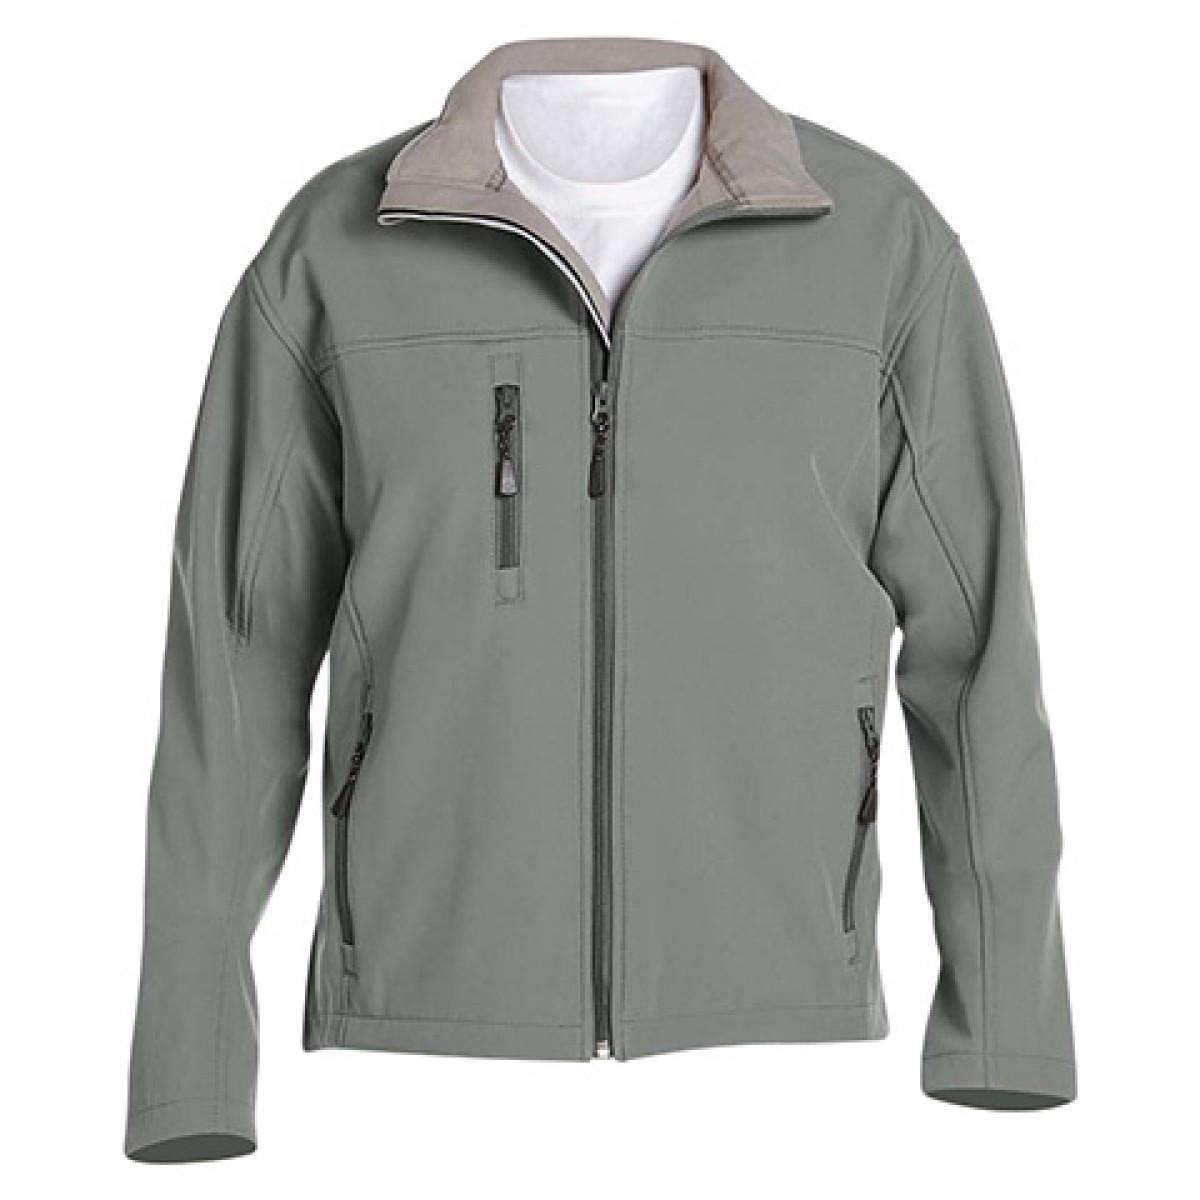 Men's Soft Shell Jacket-Charocal-XL